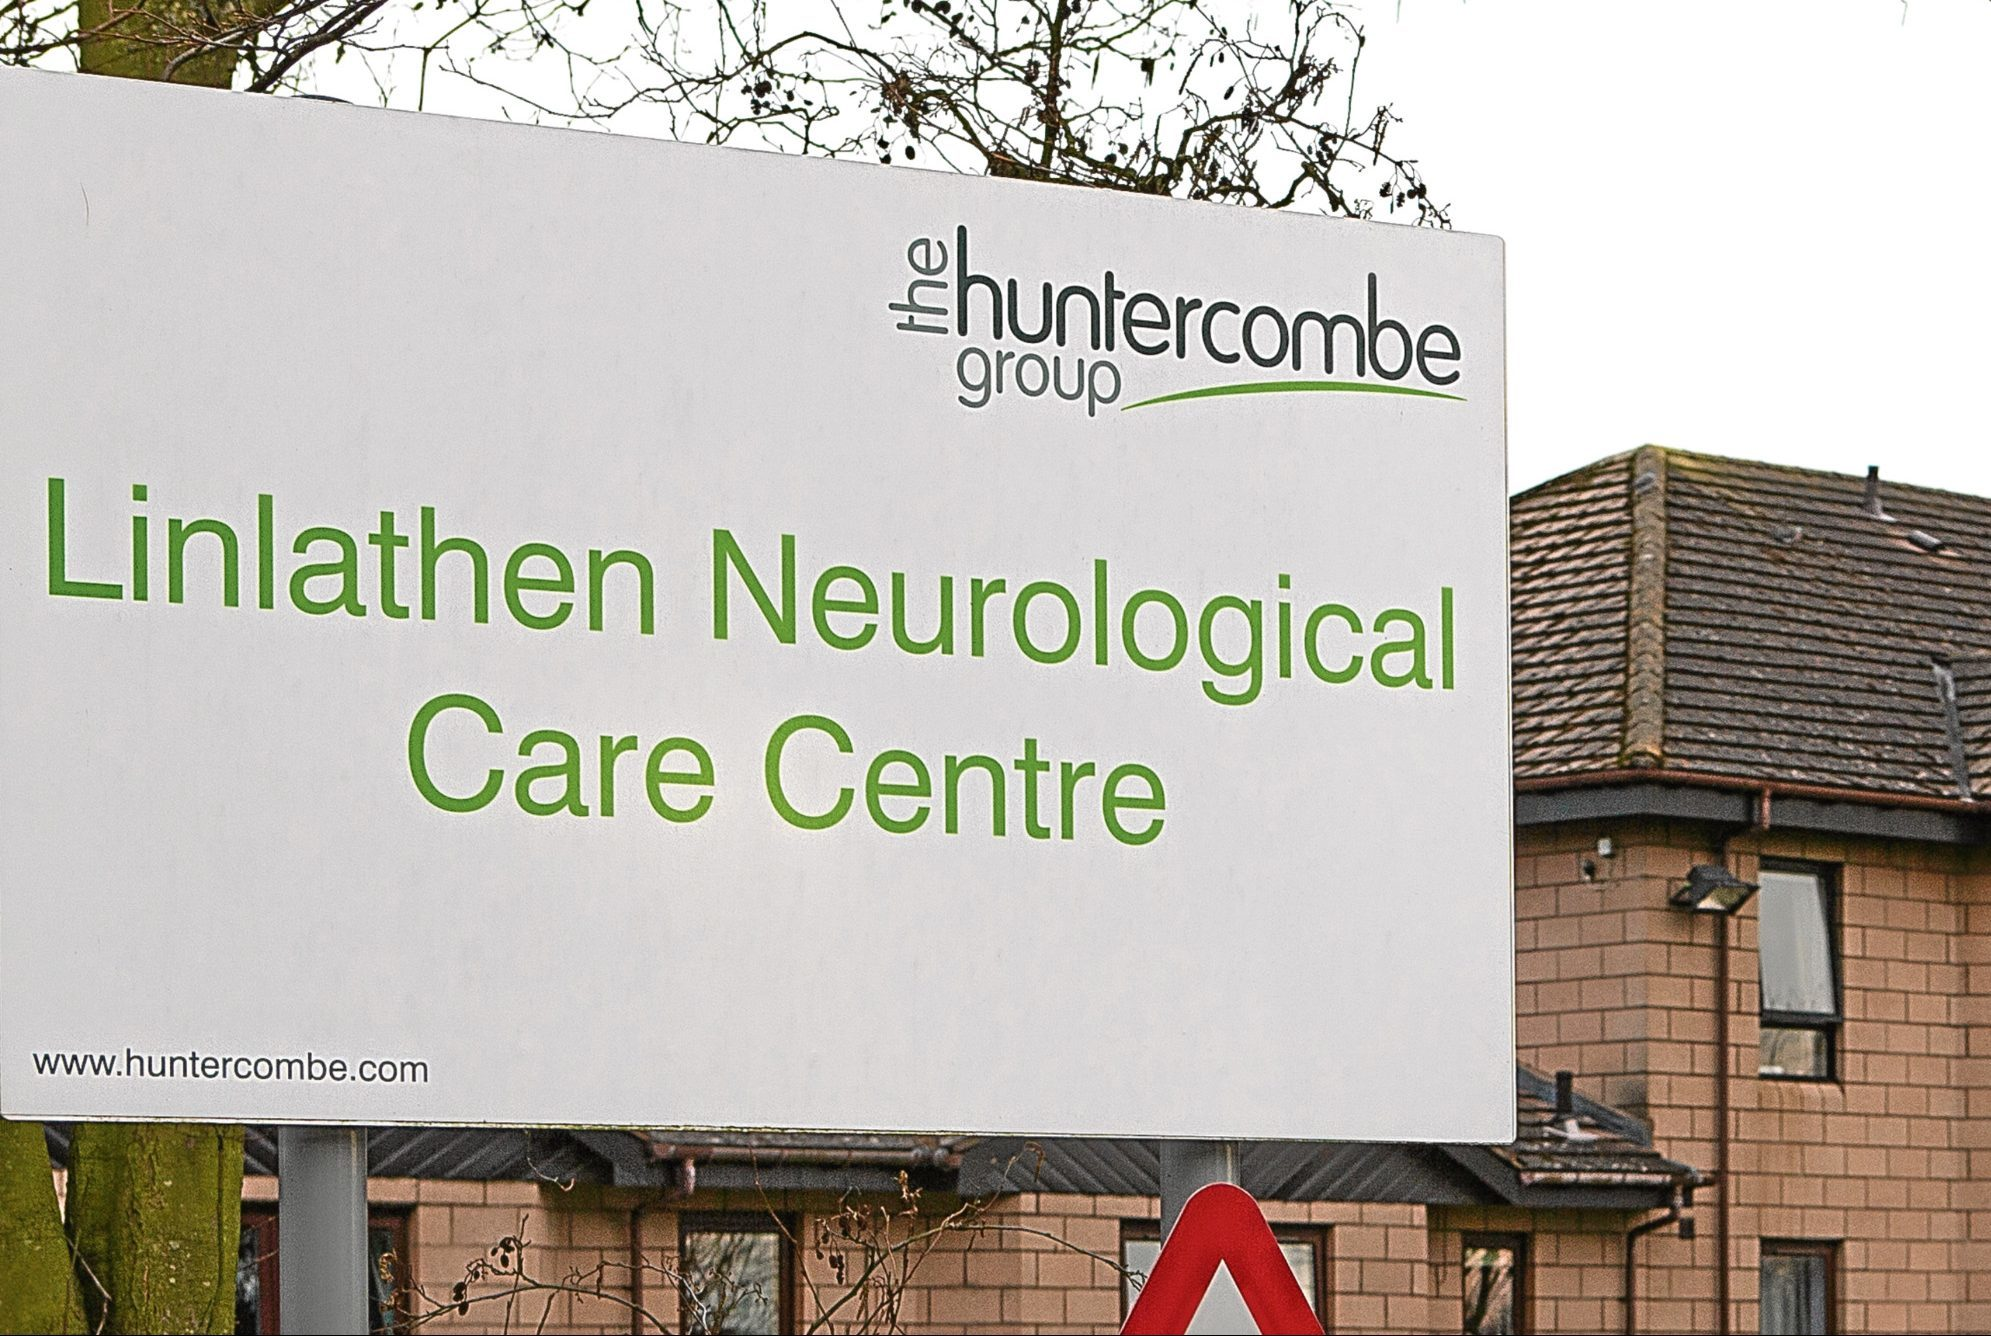 Linlathen Neurological Care Centre.